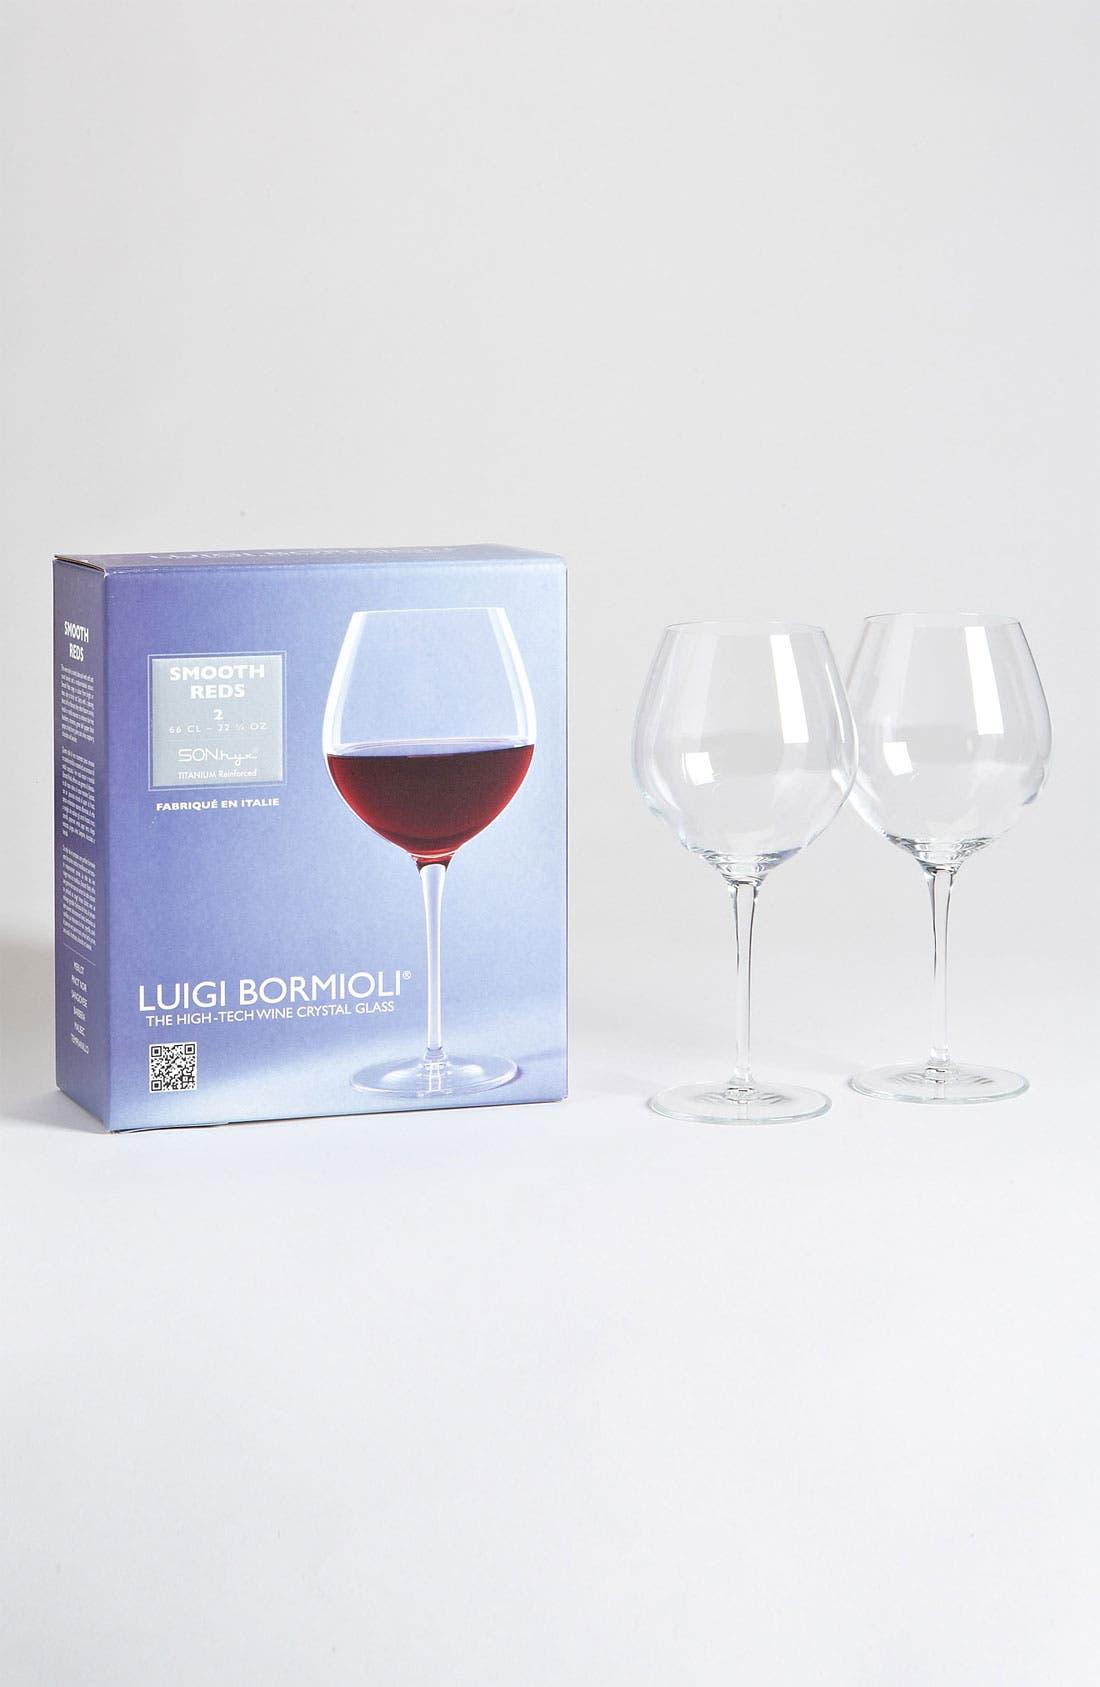 Alternate Image 1 Selected - Luigi Bormioli 'Wine Profiles Smooth Reds' Wine Glasses (Set of 2)